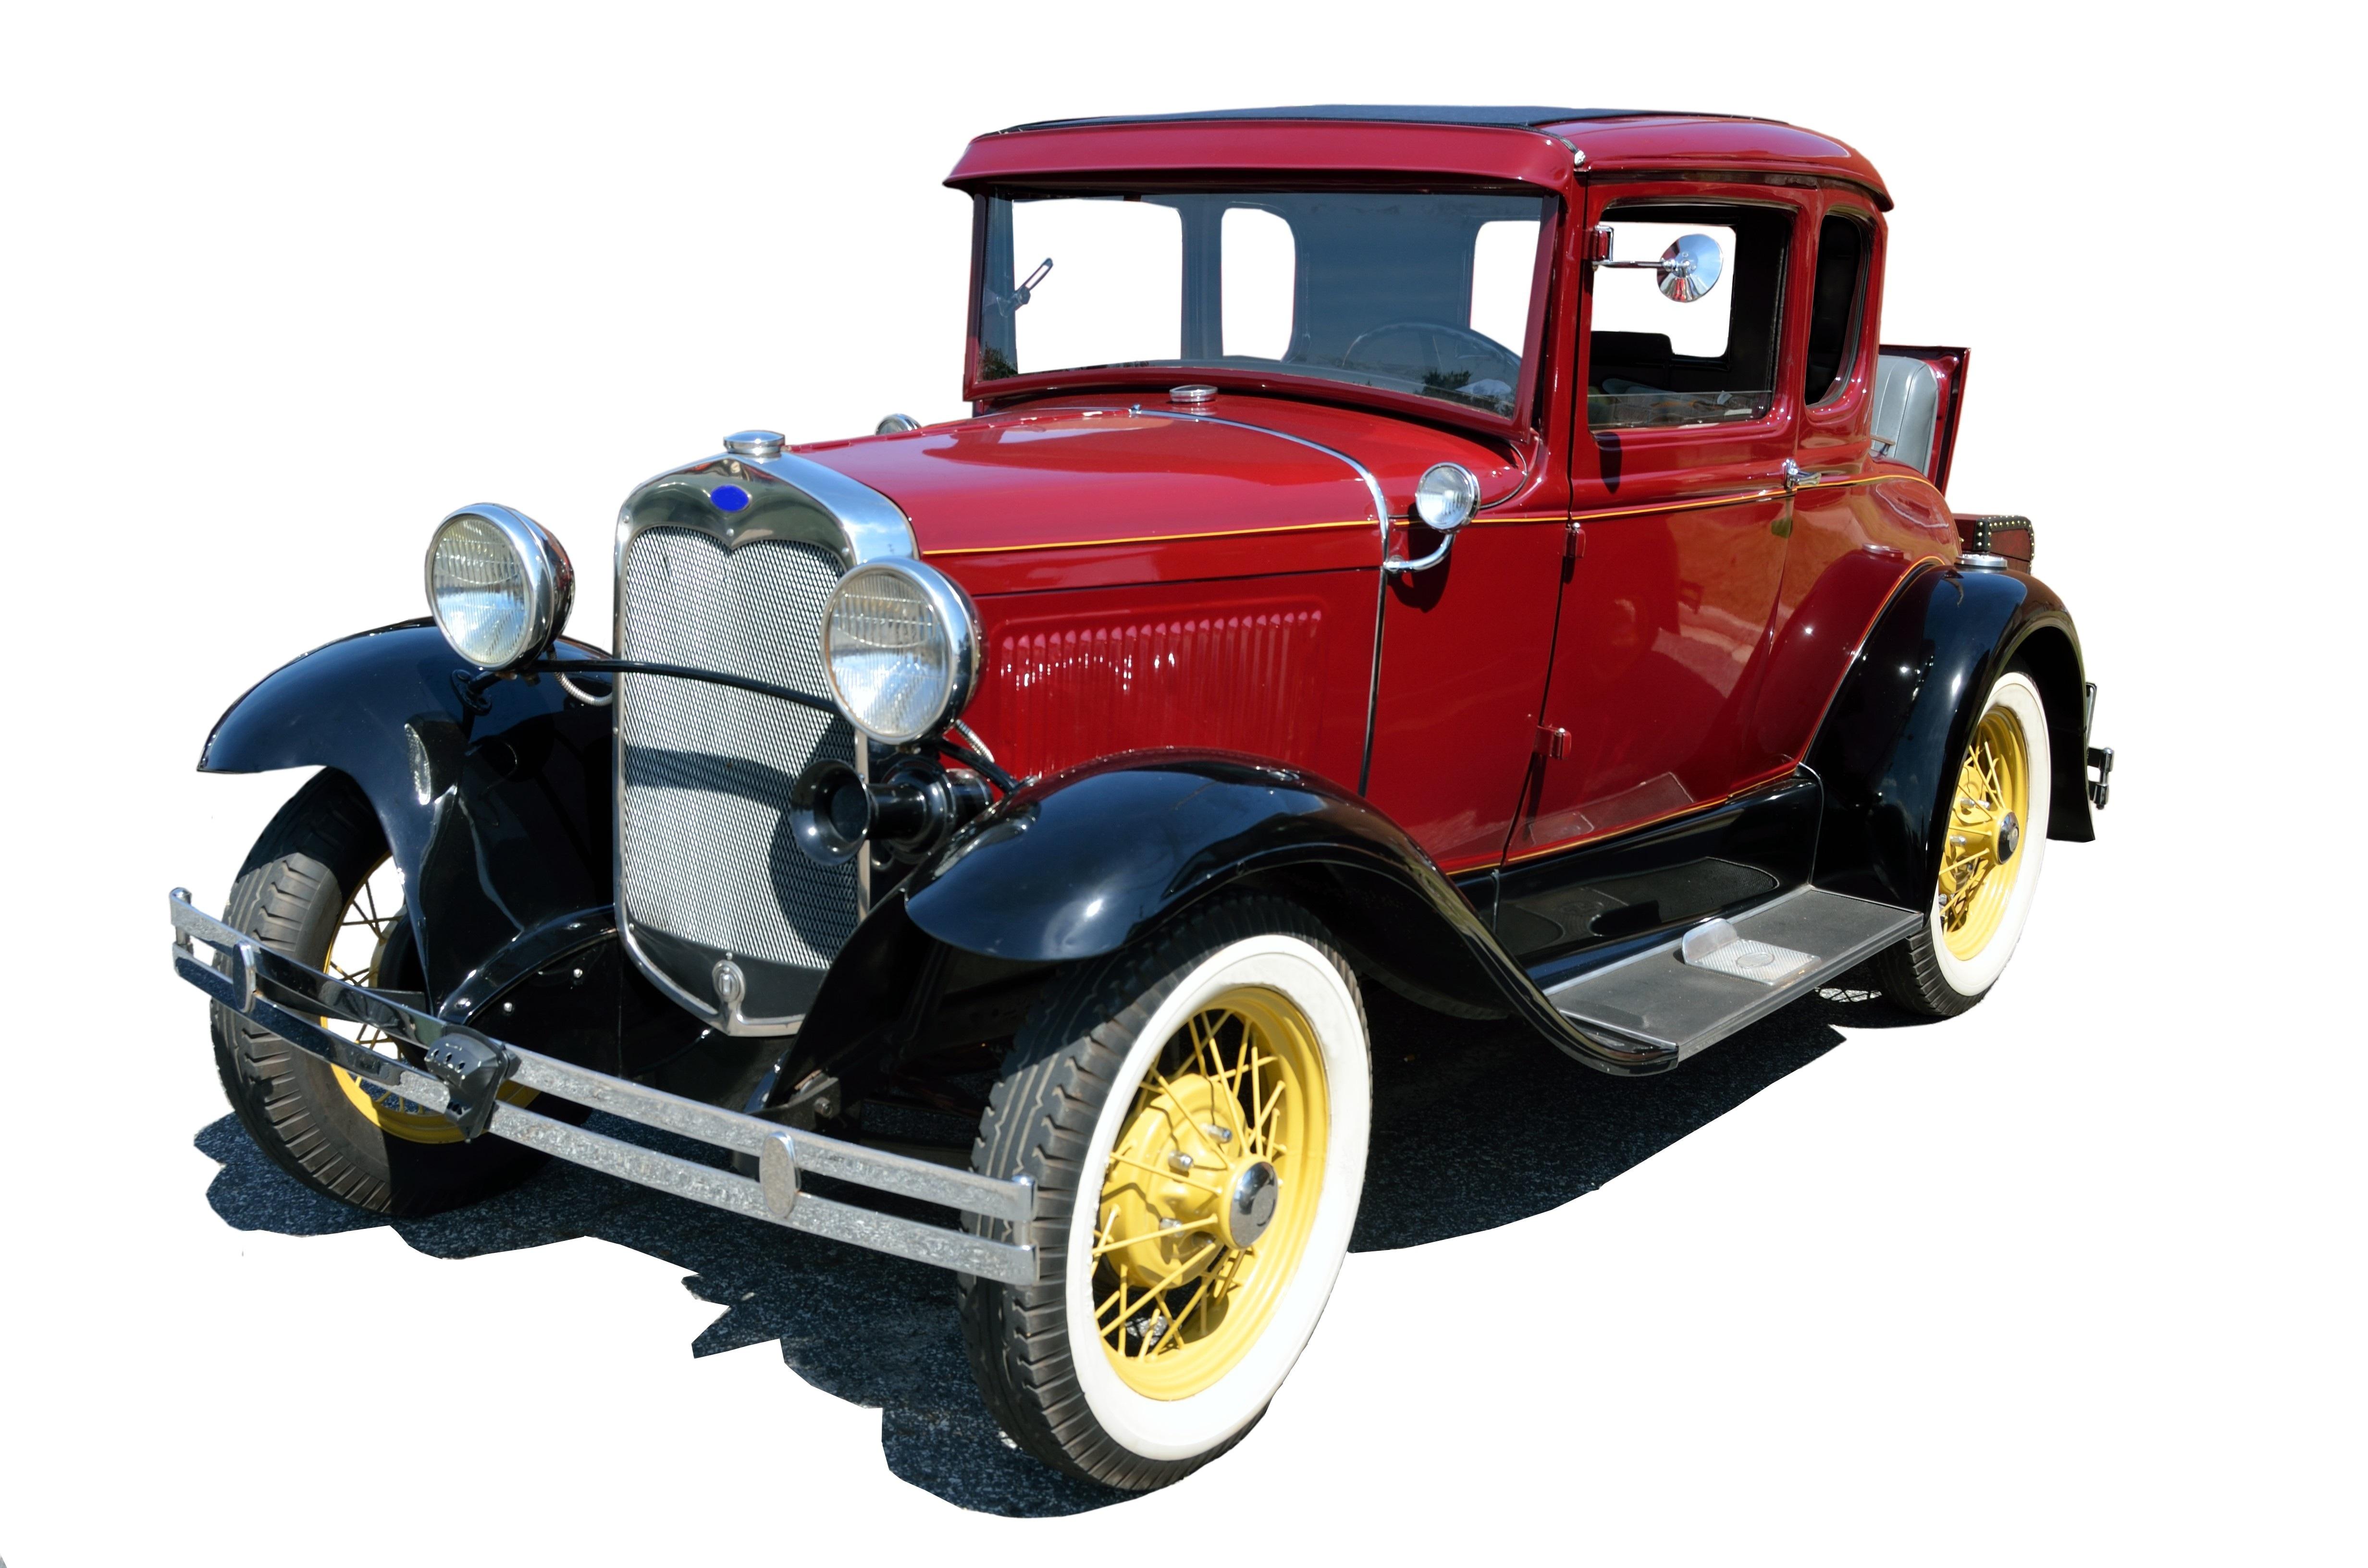 Free Images : antique, wheel, retro, old, isolated, transportation ...